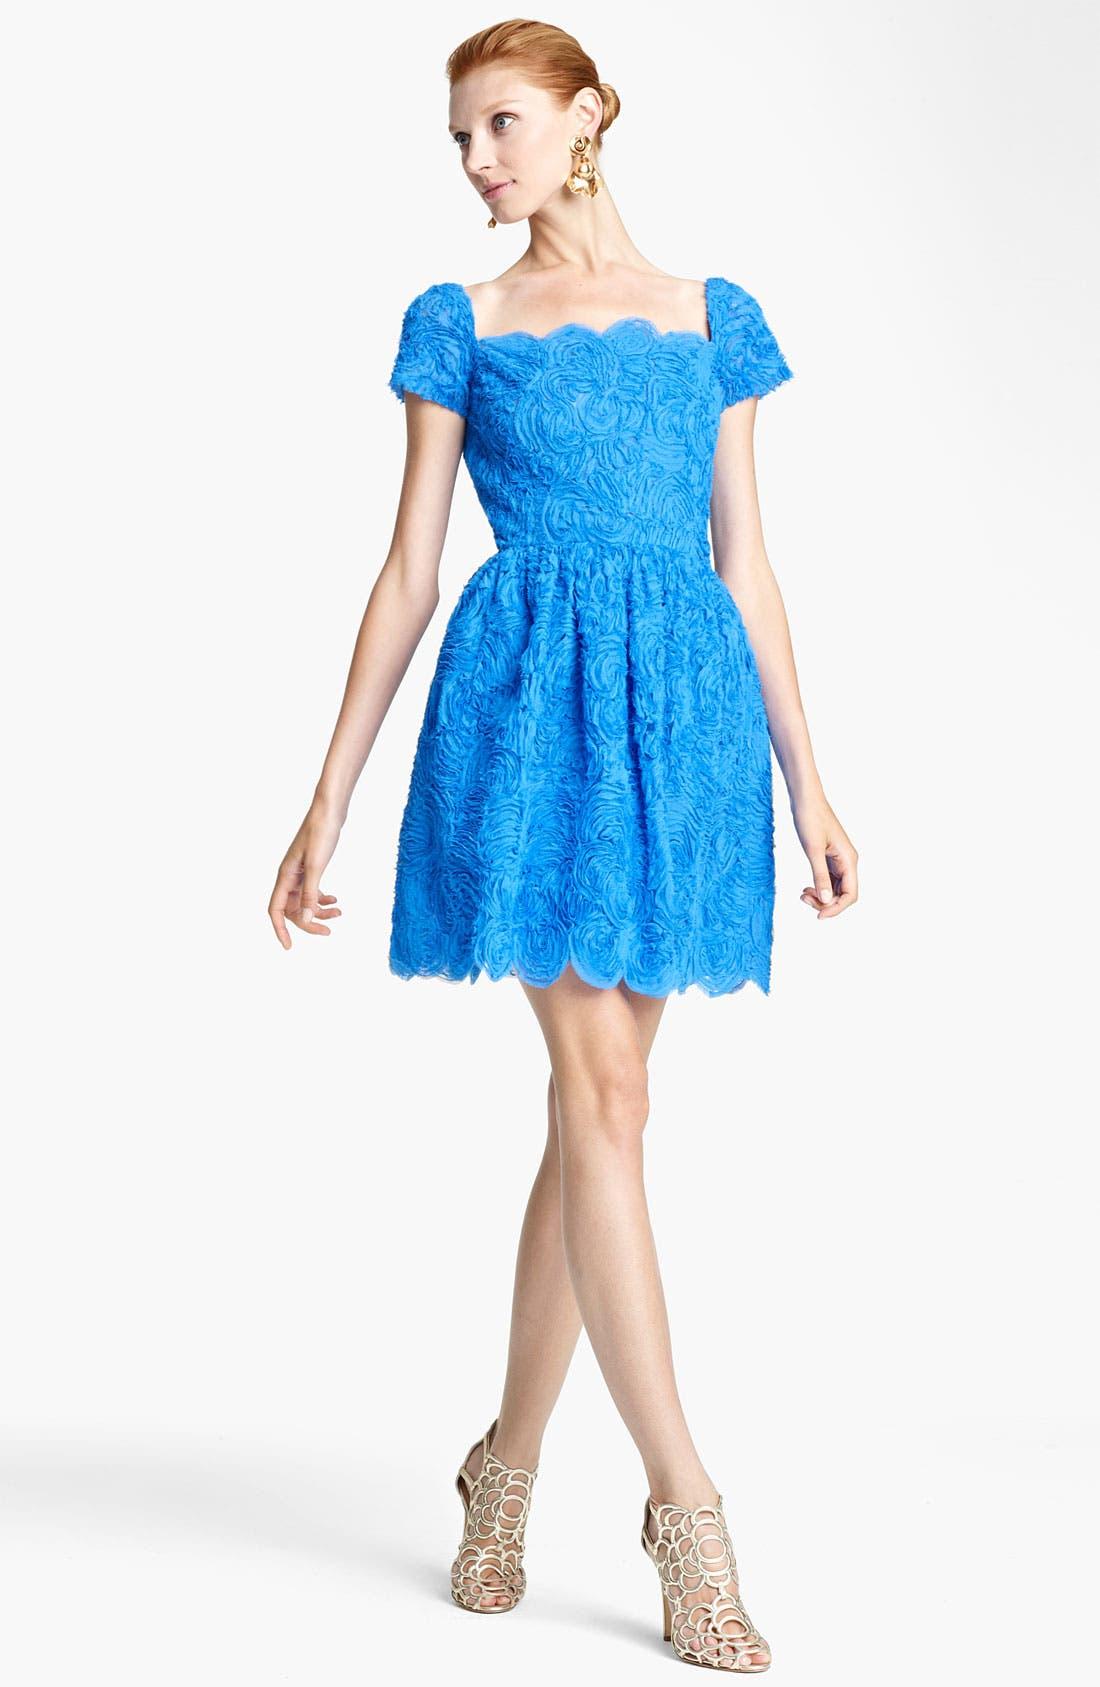 Main Image - Oscar de la Renta Embroidered Cocktail Dress